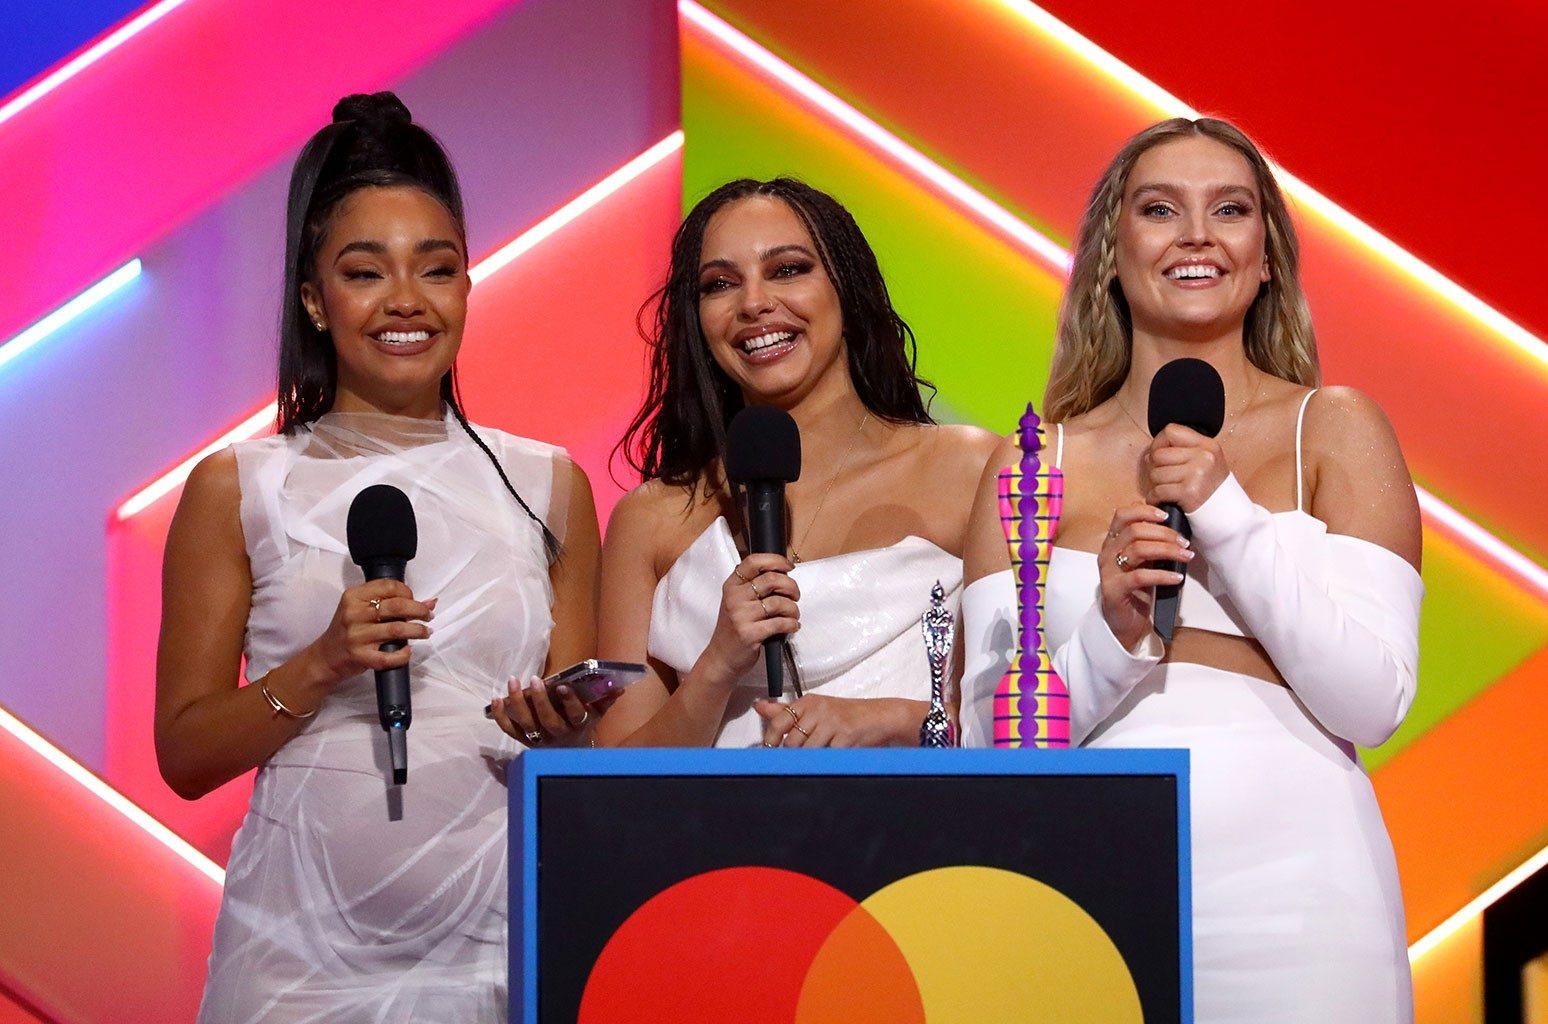 little-mix-awards-2021-billboard-1548-1620762730-compressed